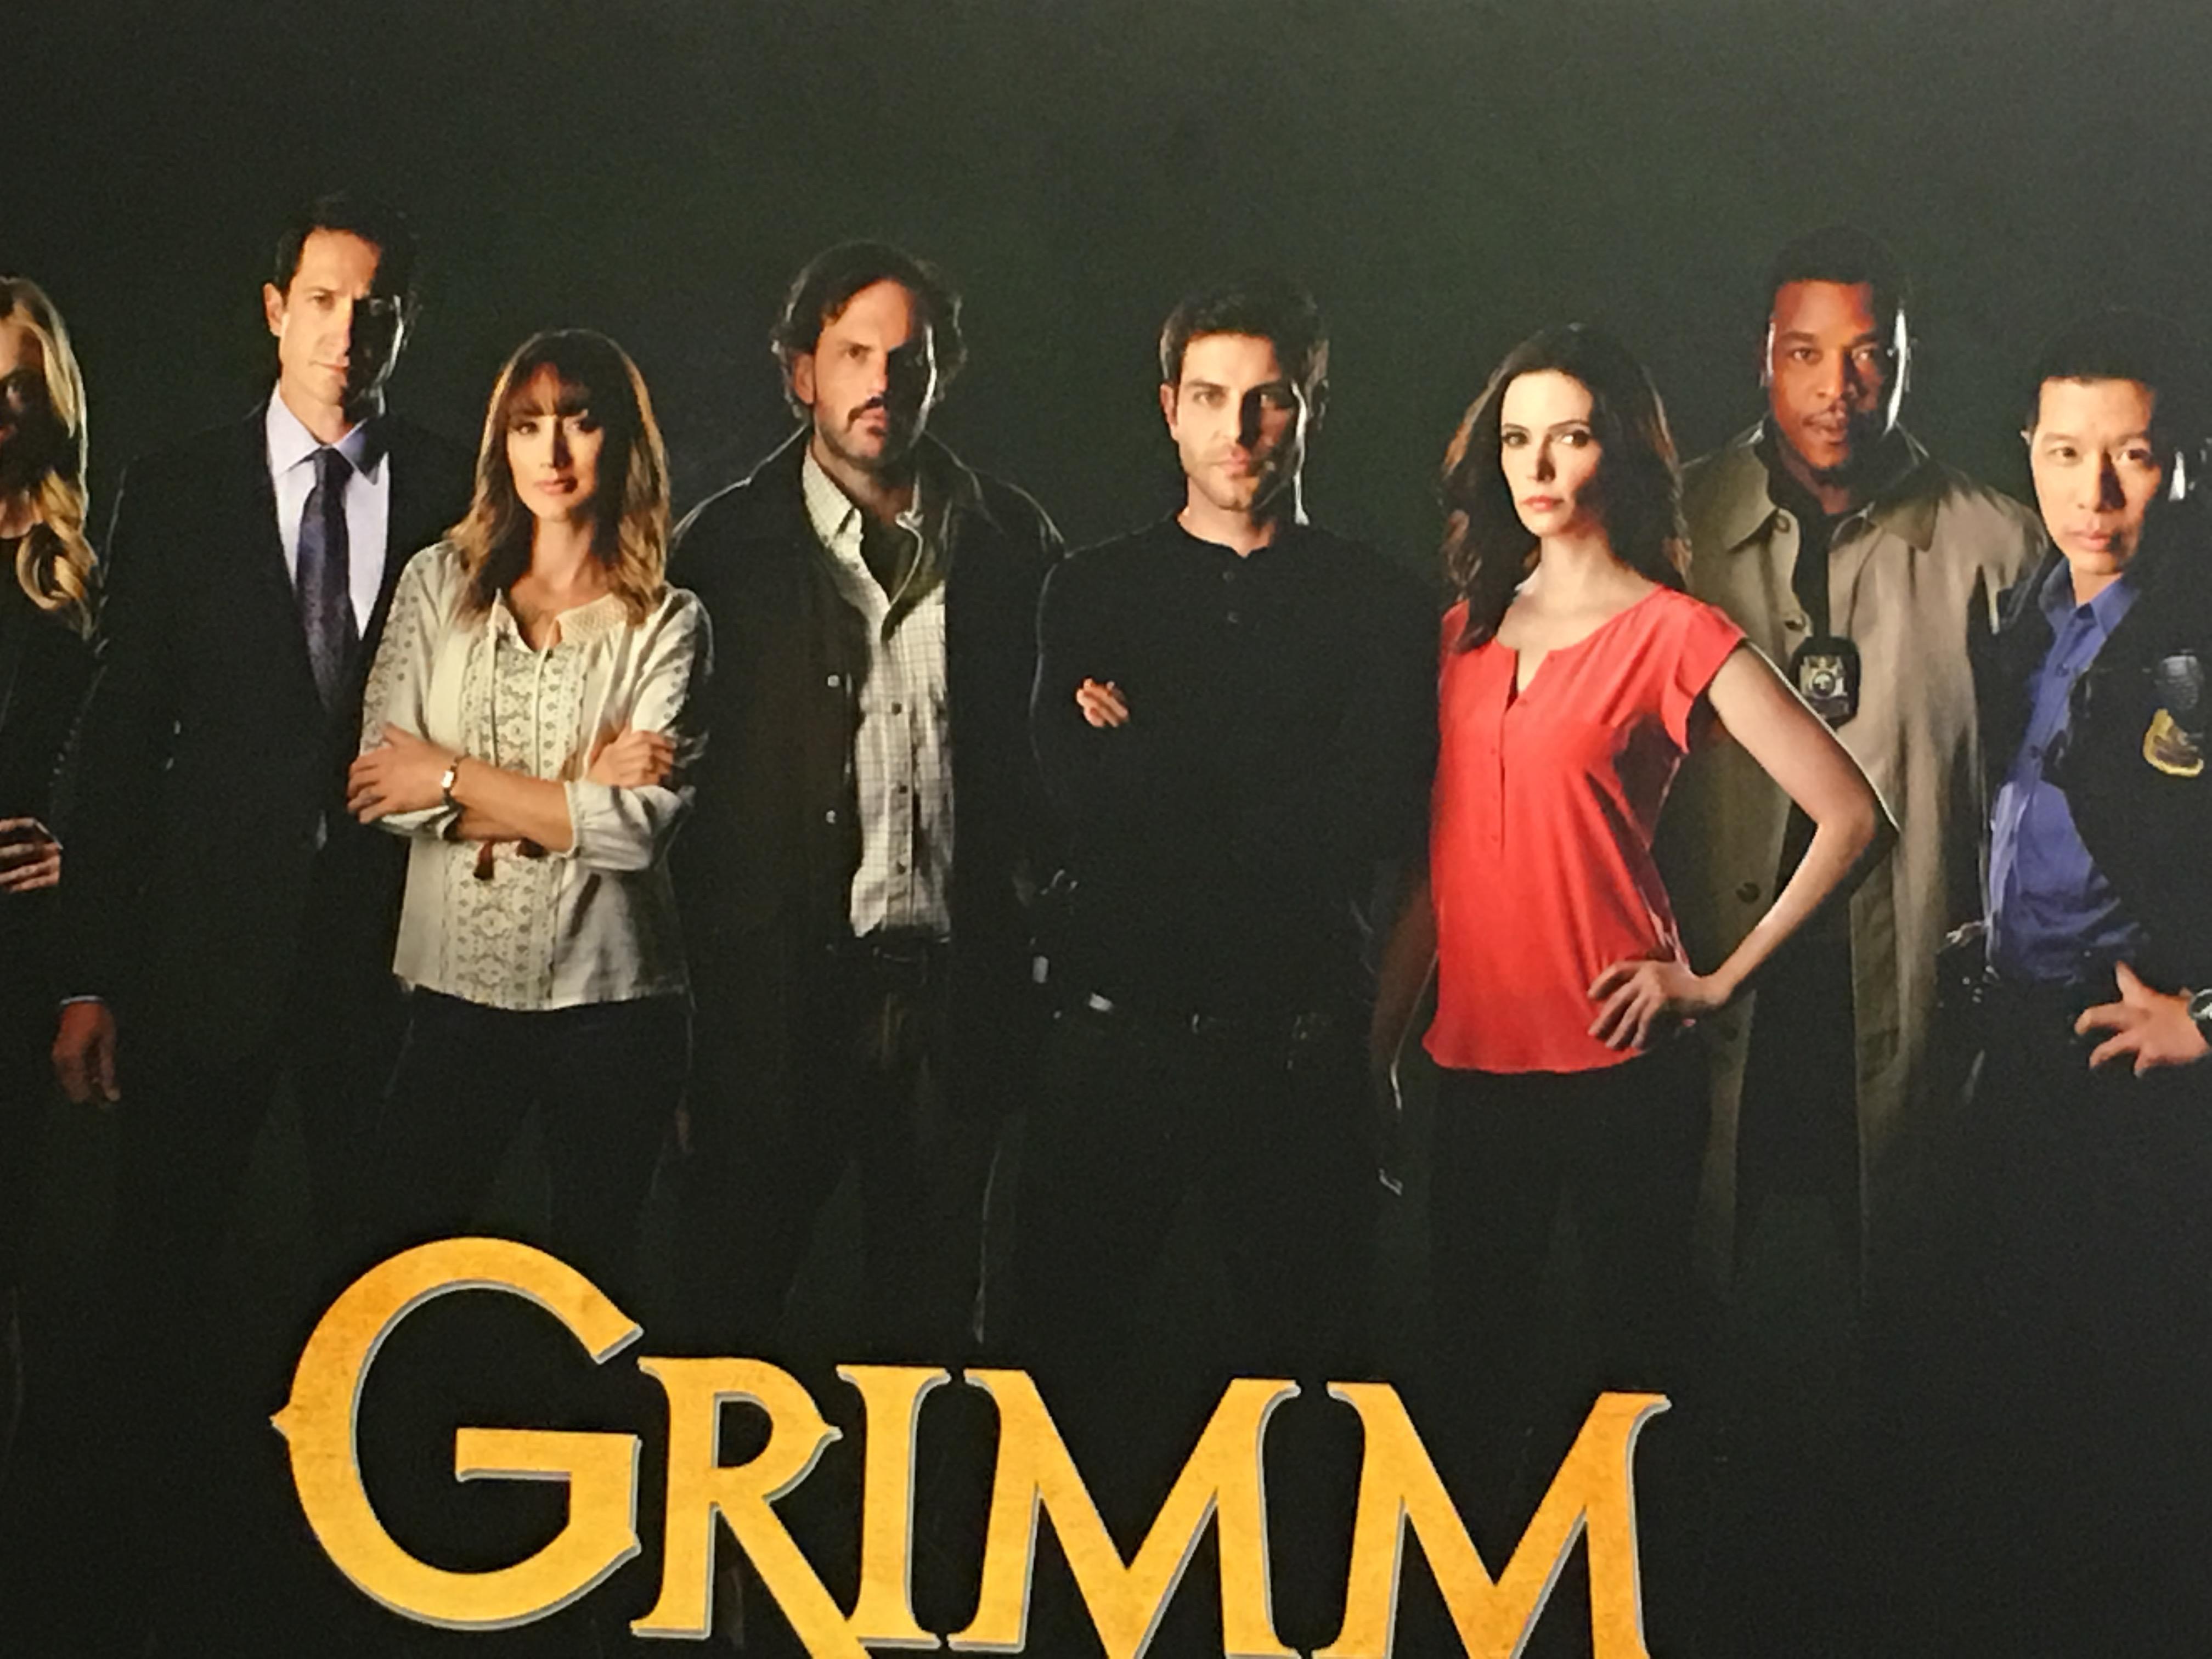 NBC's Grimm Celebrates 100 Episodes